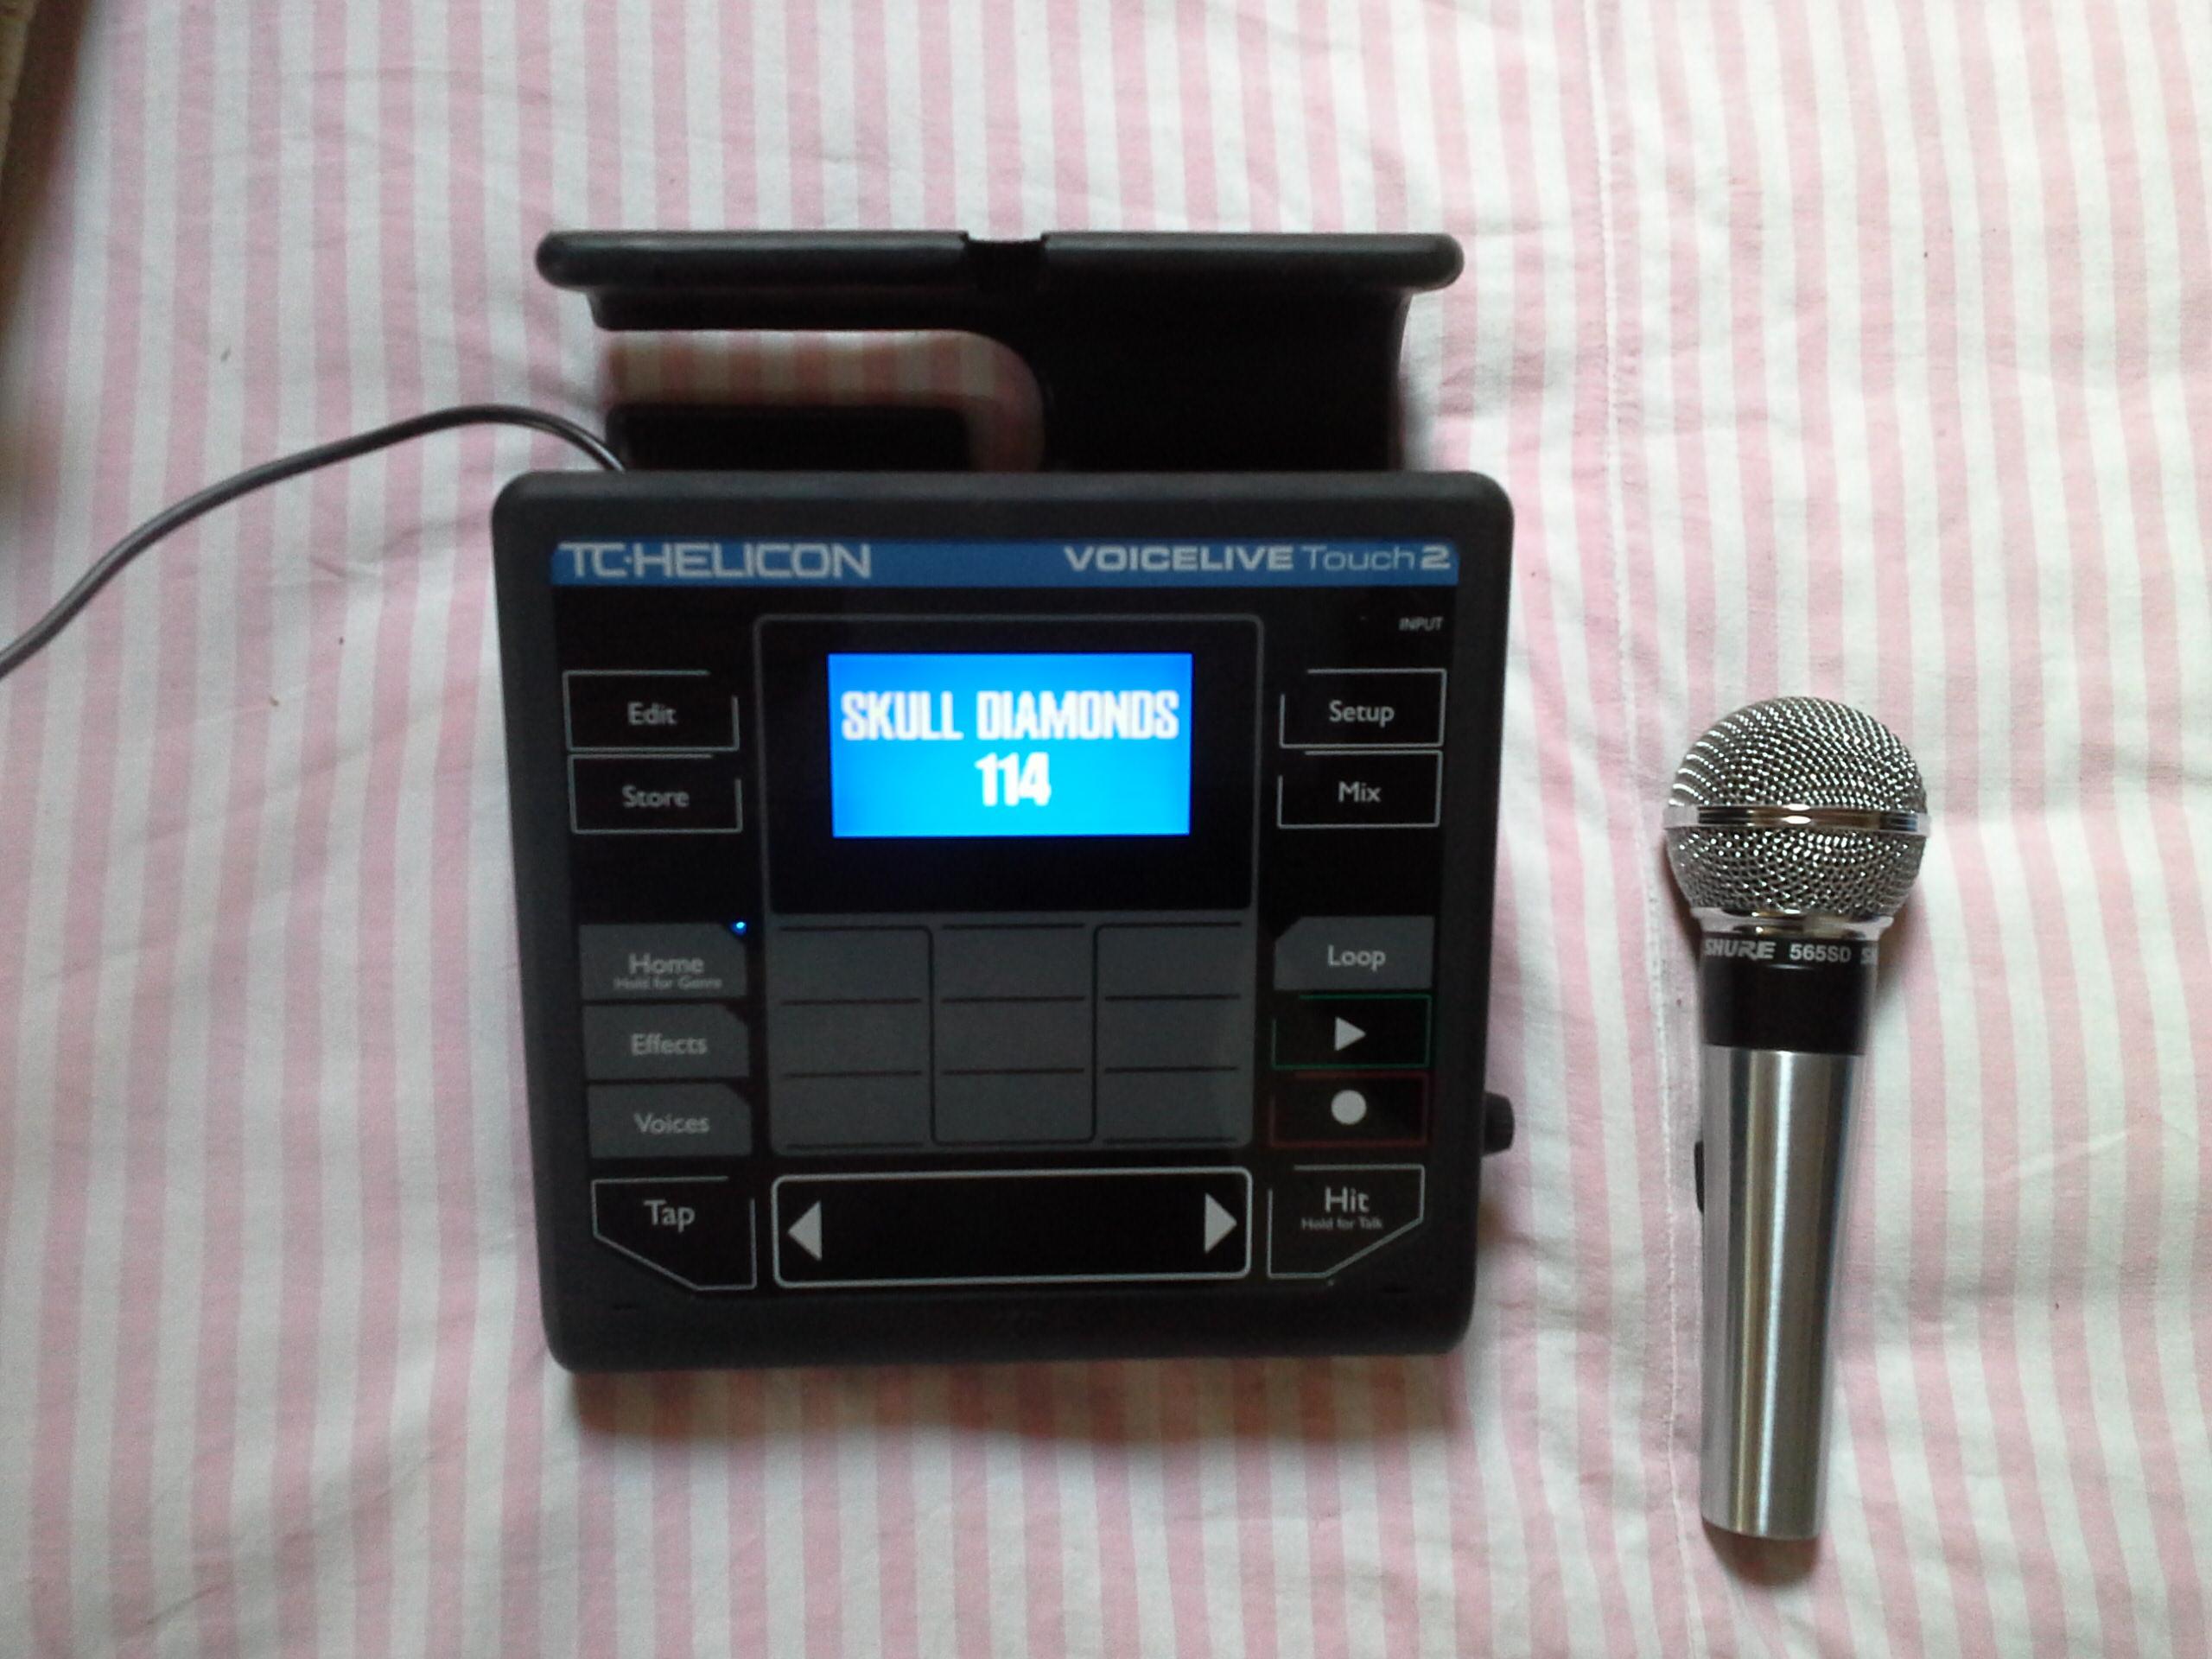 tc helicon voicelive touch 2 image 1804670 audiofanzine. Black Bedroom Furniture Sets. Home Design Ideas